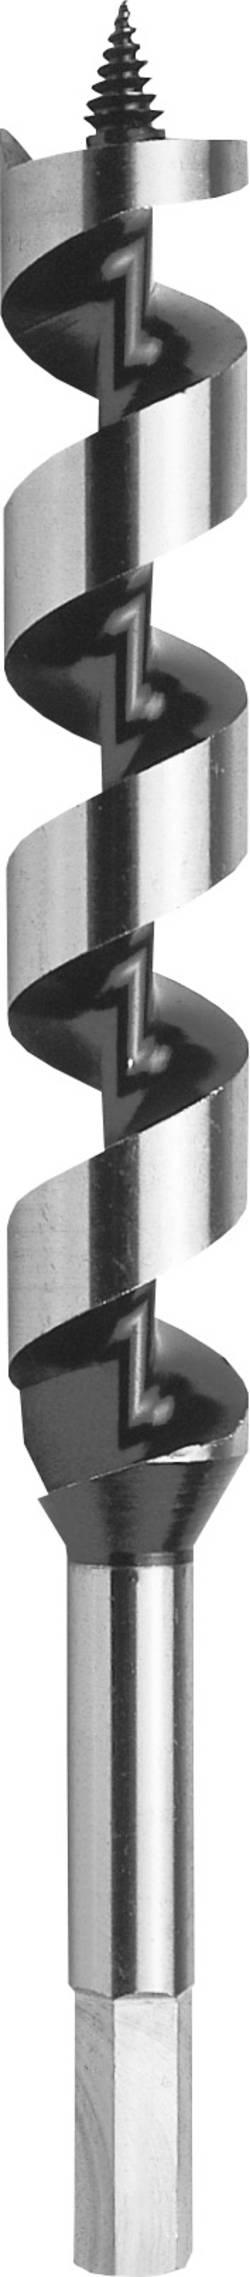 Hadovitý vrták 18 mm Bosch Accessories 2609255245, uchycení šestihran, délka 450 mm 1 ks